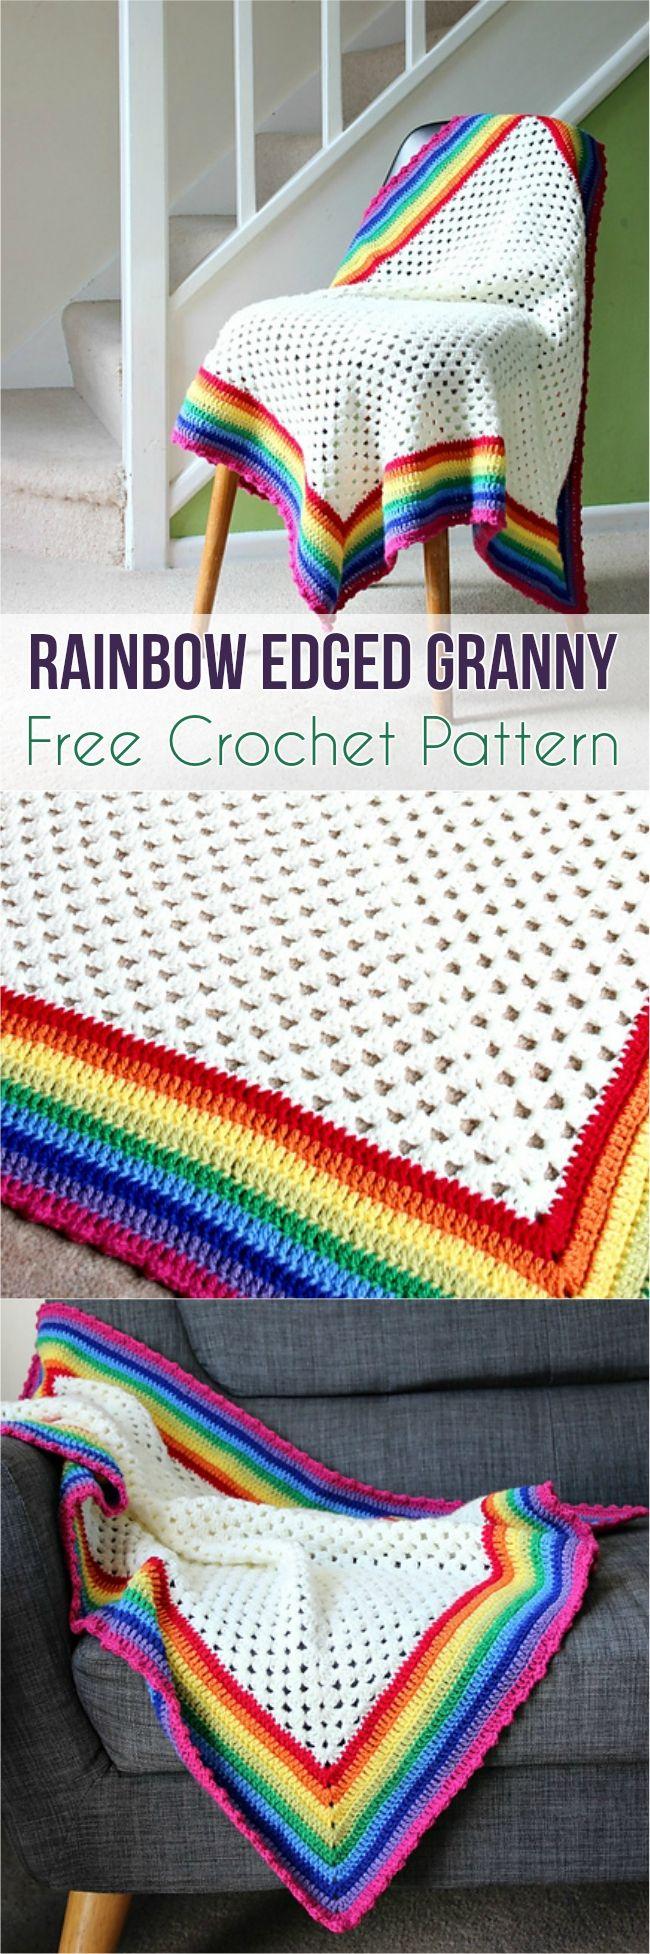 Rainbow Edged Granny - Free Crochet Pattern | Manta, Cobija y Tejido